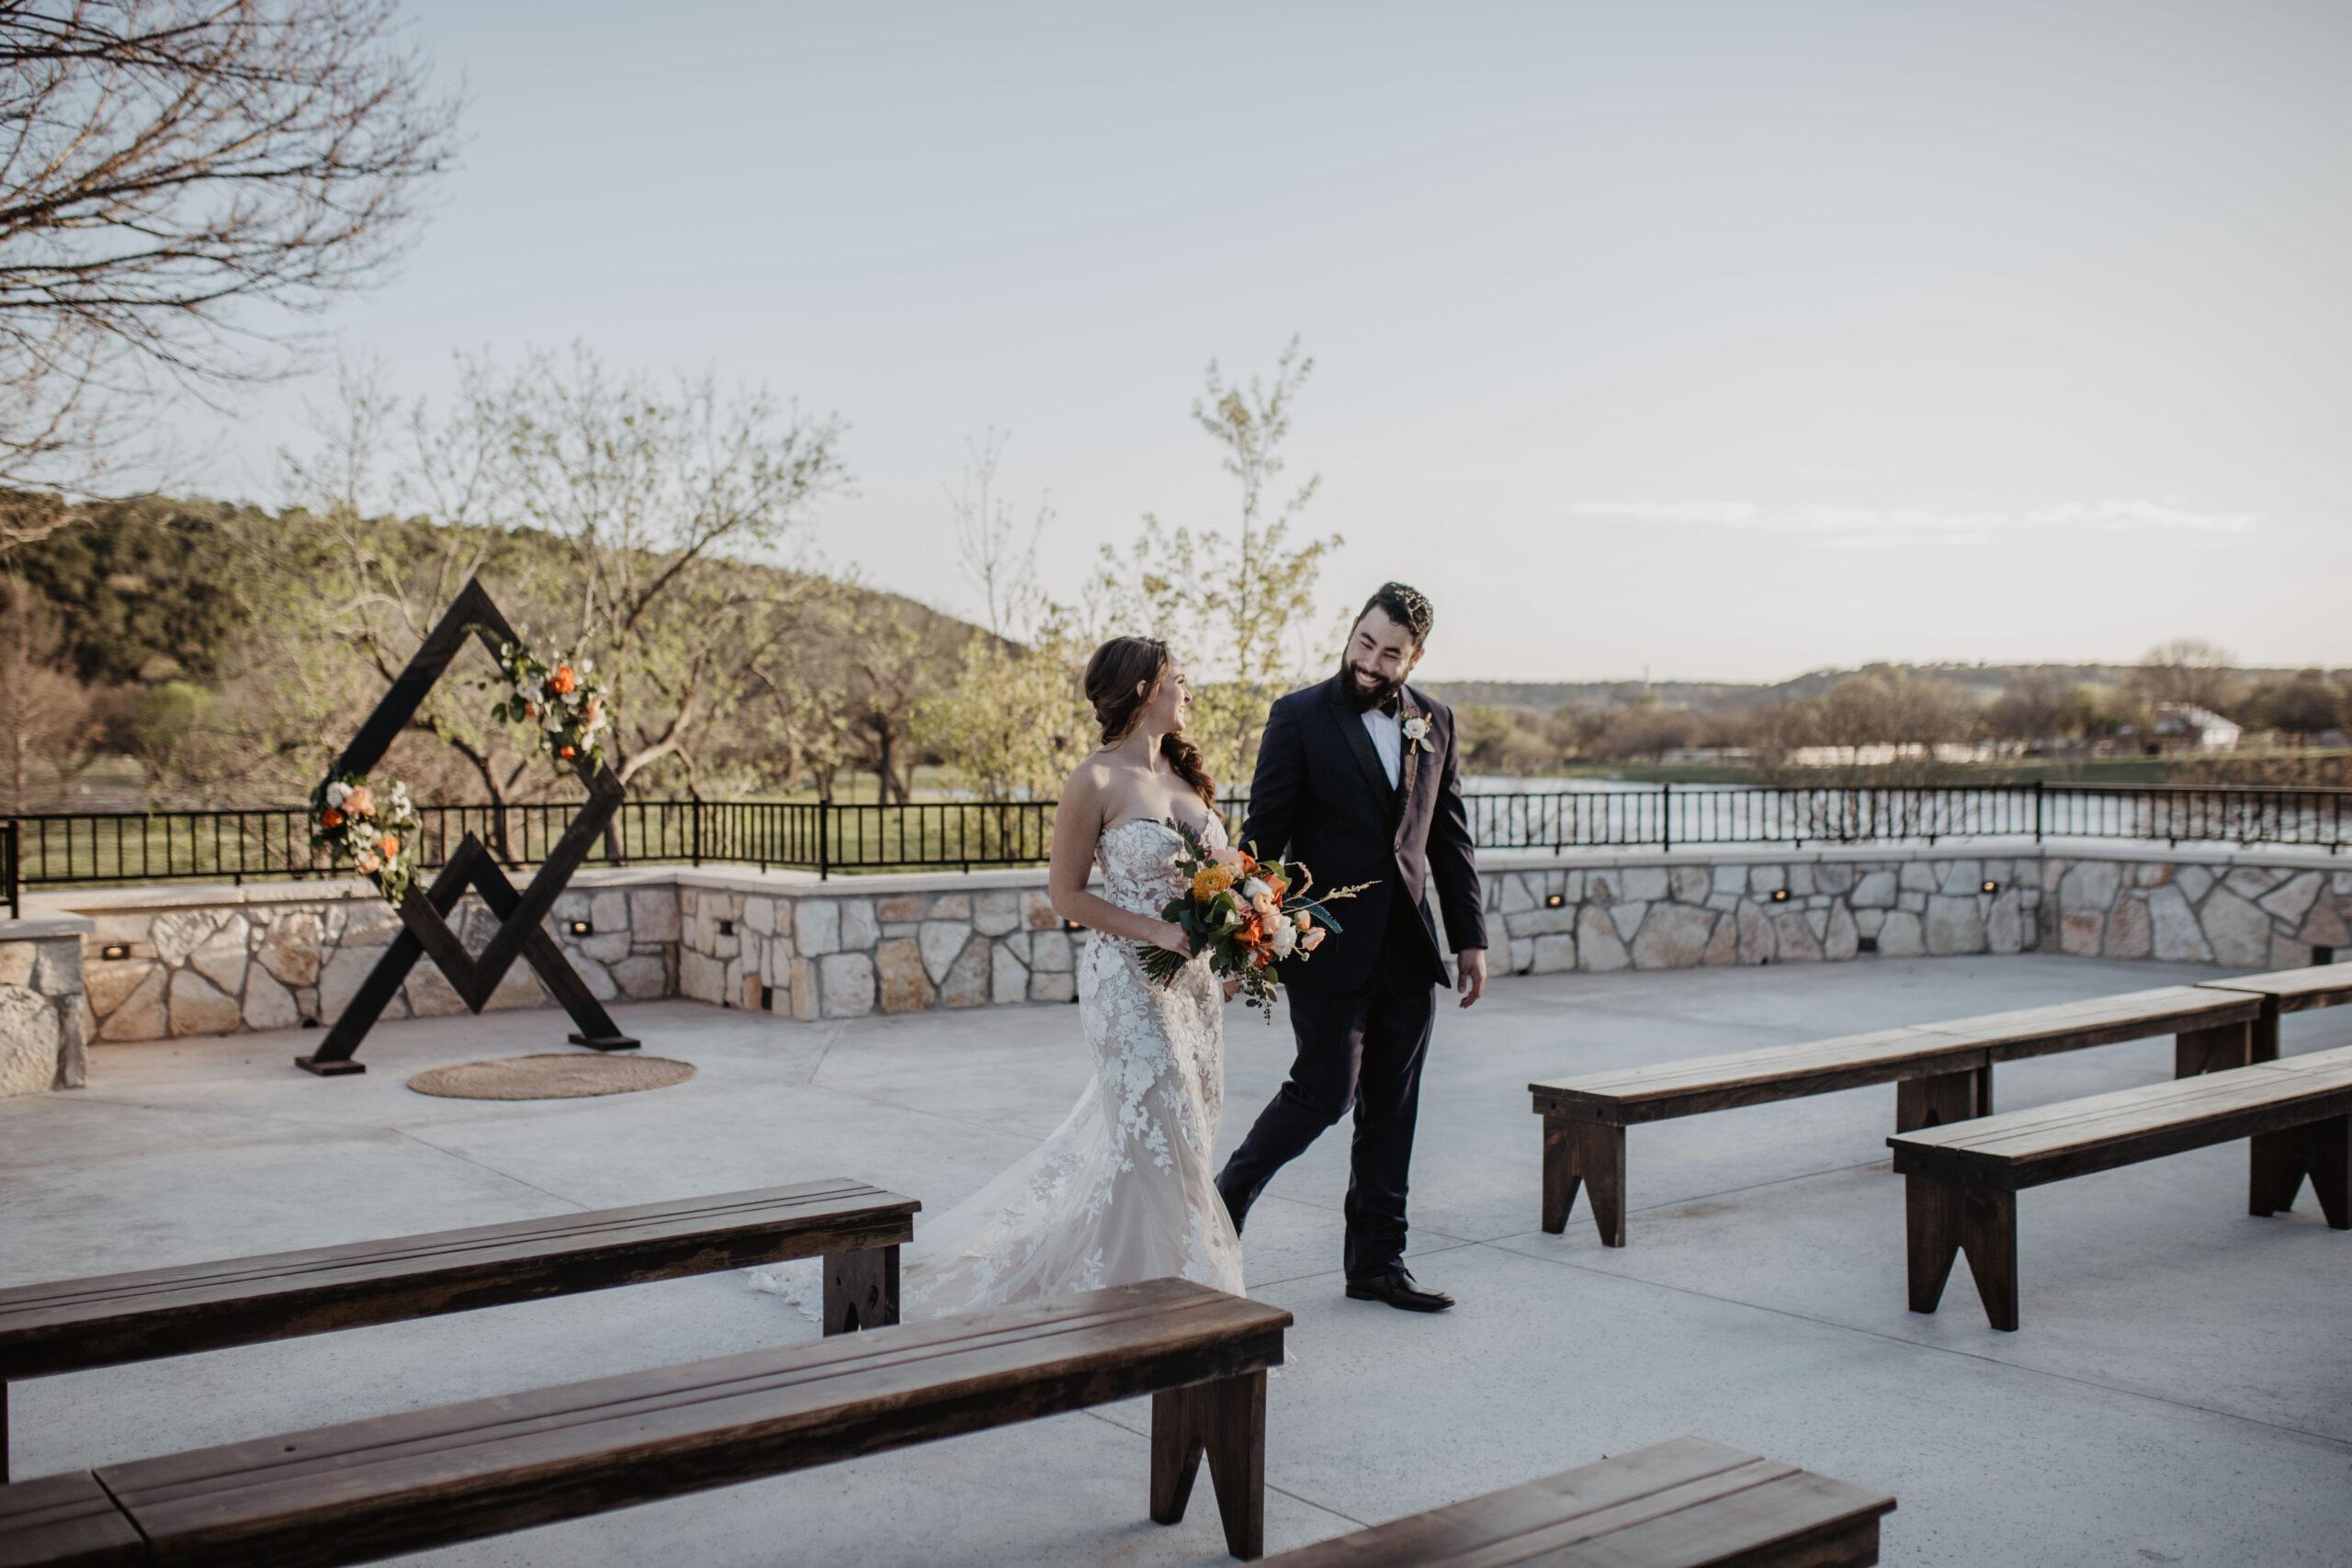 Sendera Springs Ceremony site